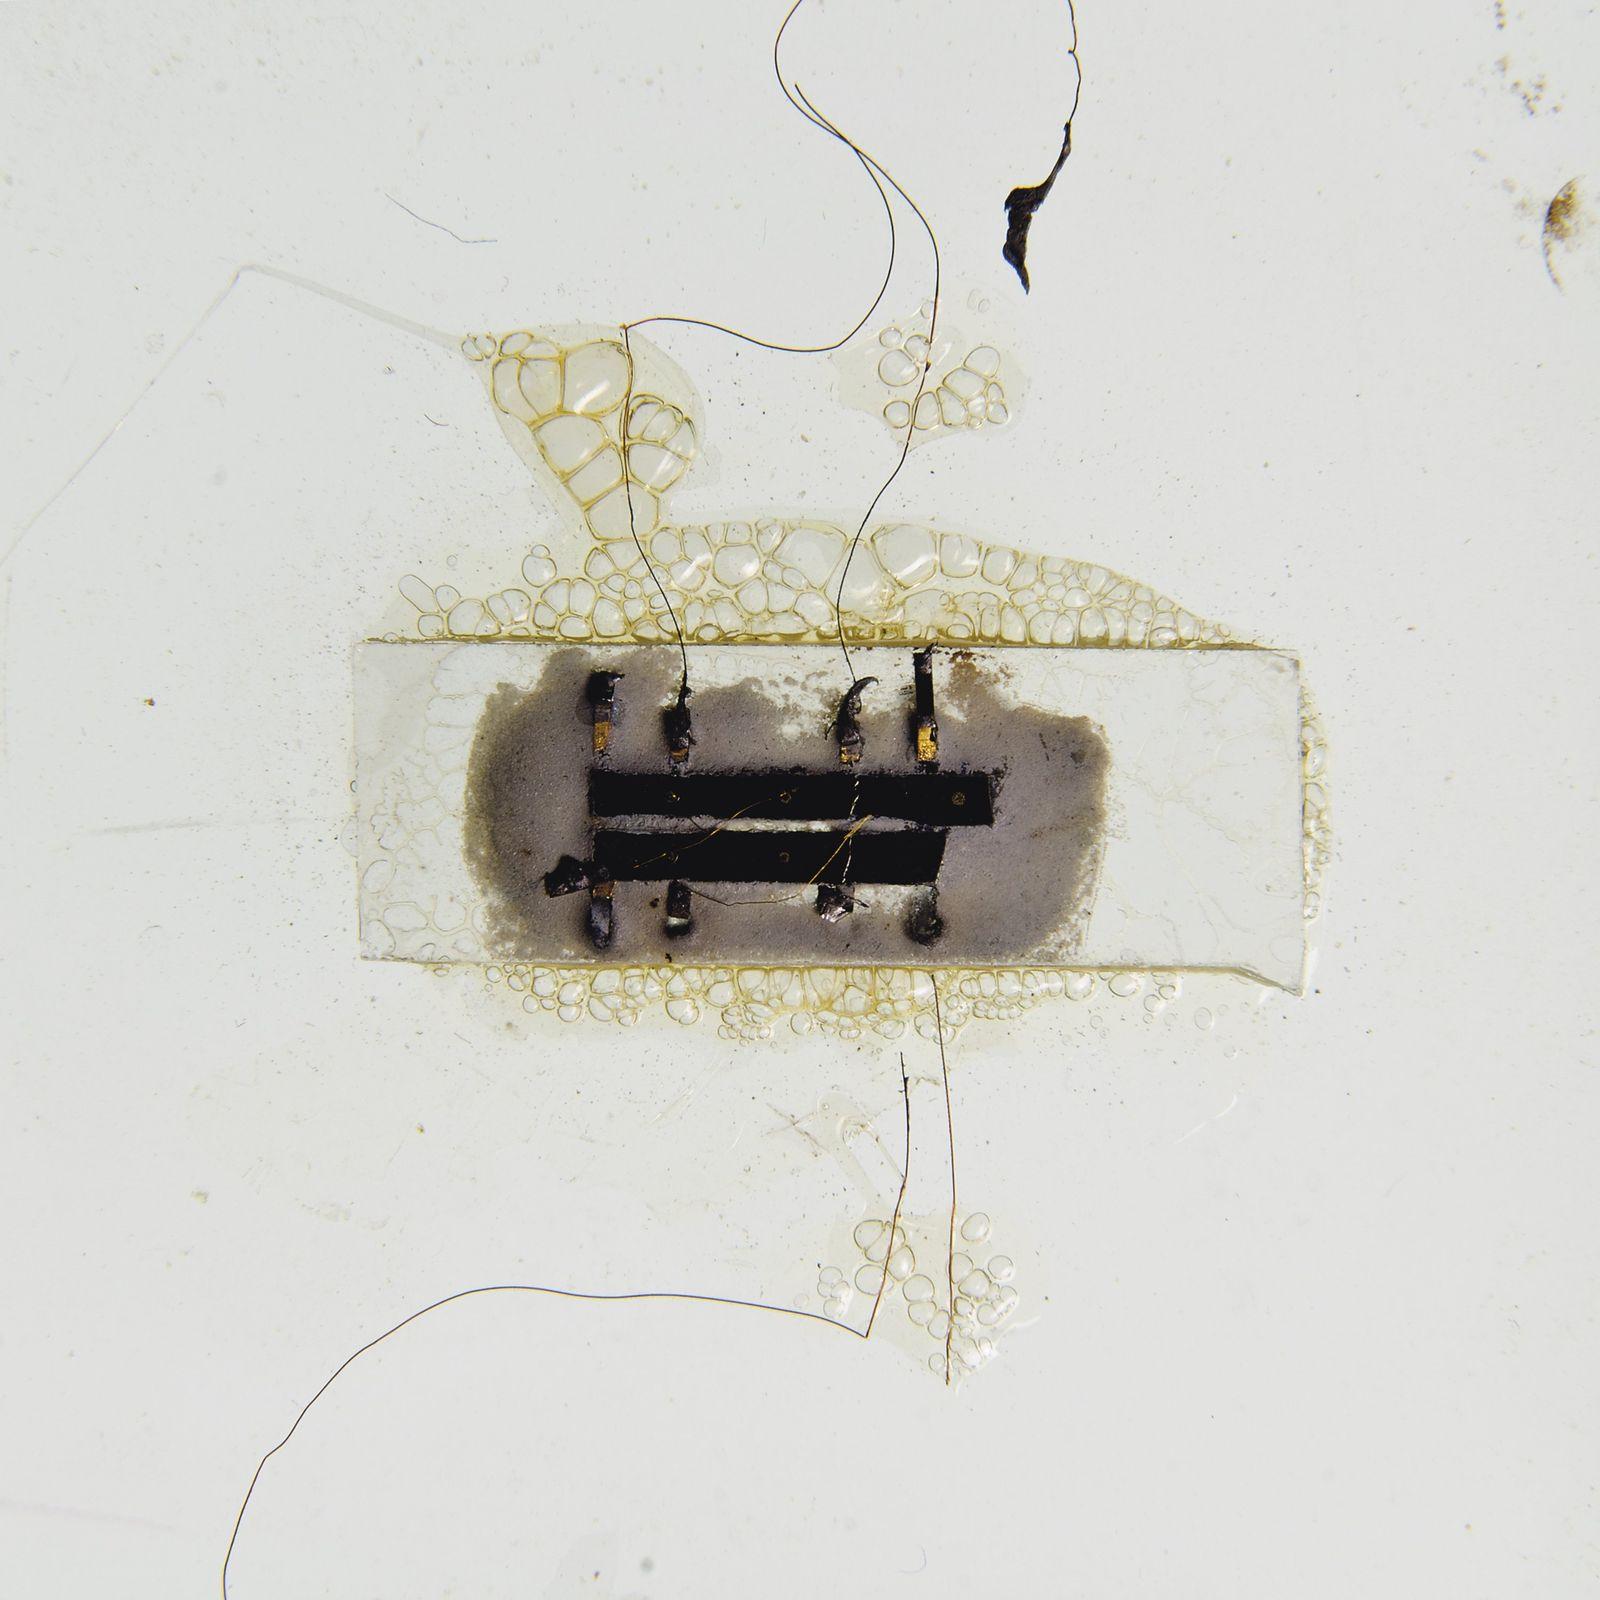 Mikrochip 1958 Jack Kilby